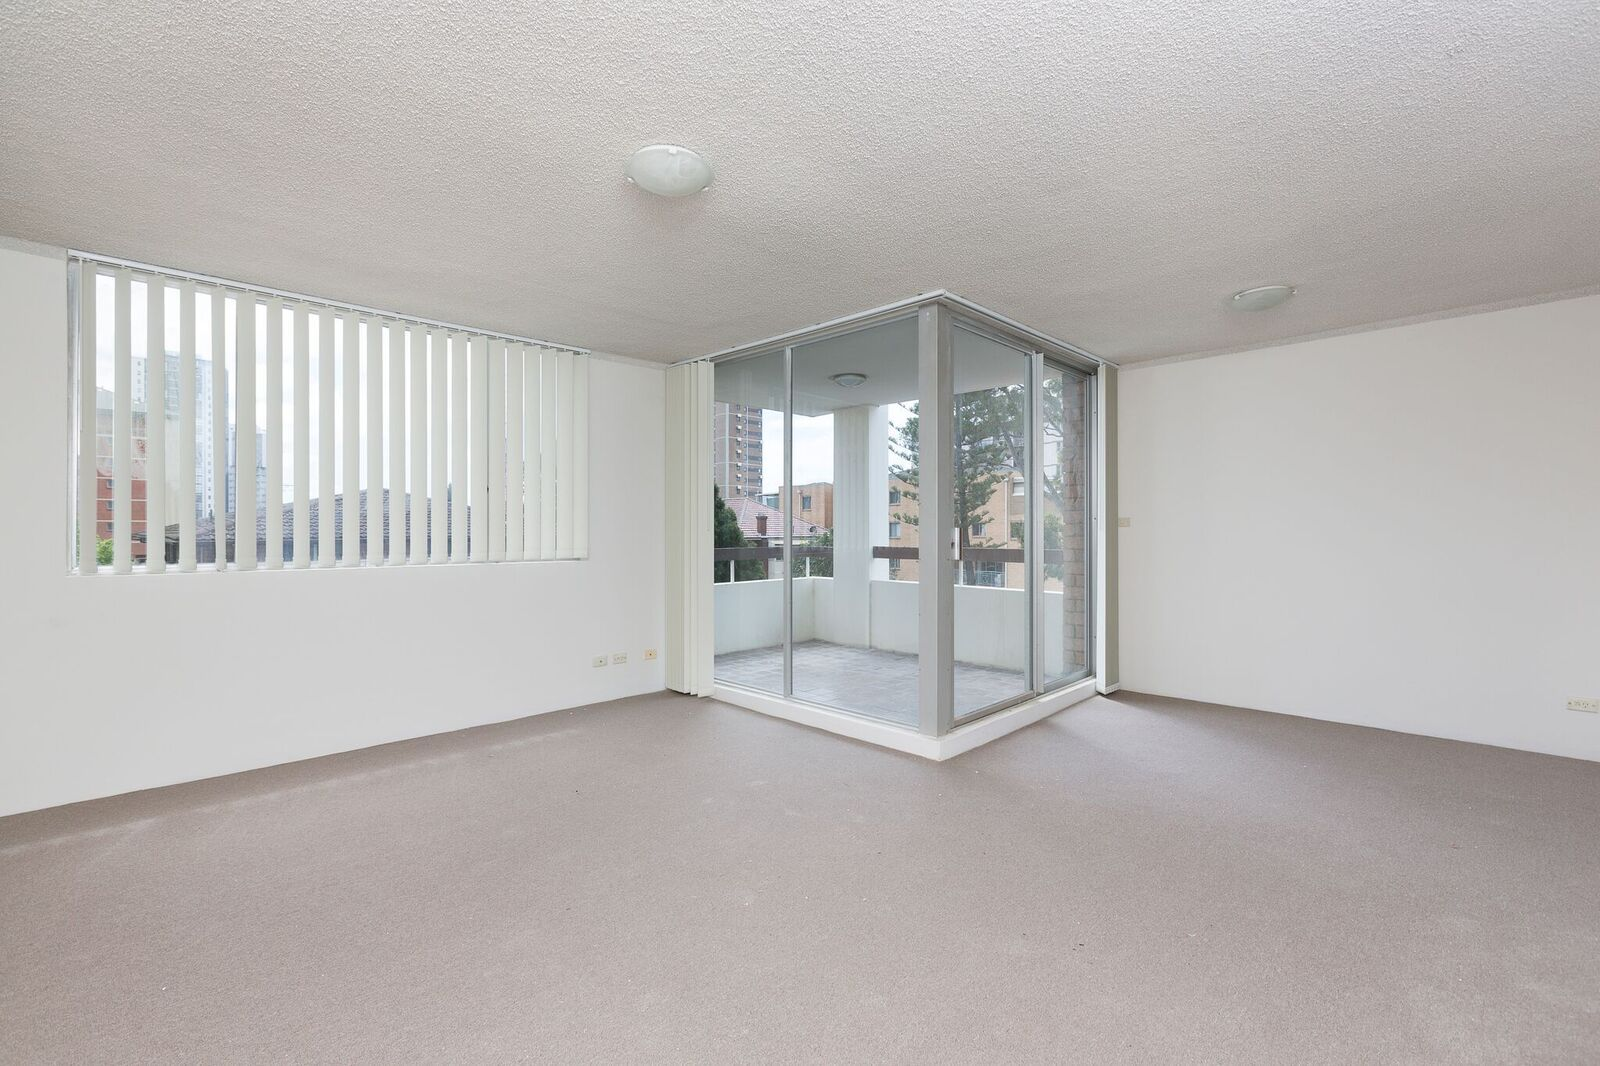 3C/26 Belmore  Road, Burwood NSW 2134, Image 1